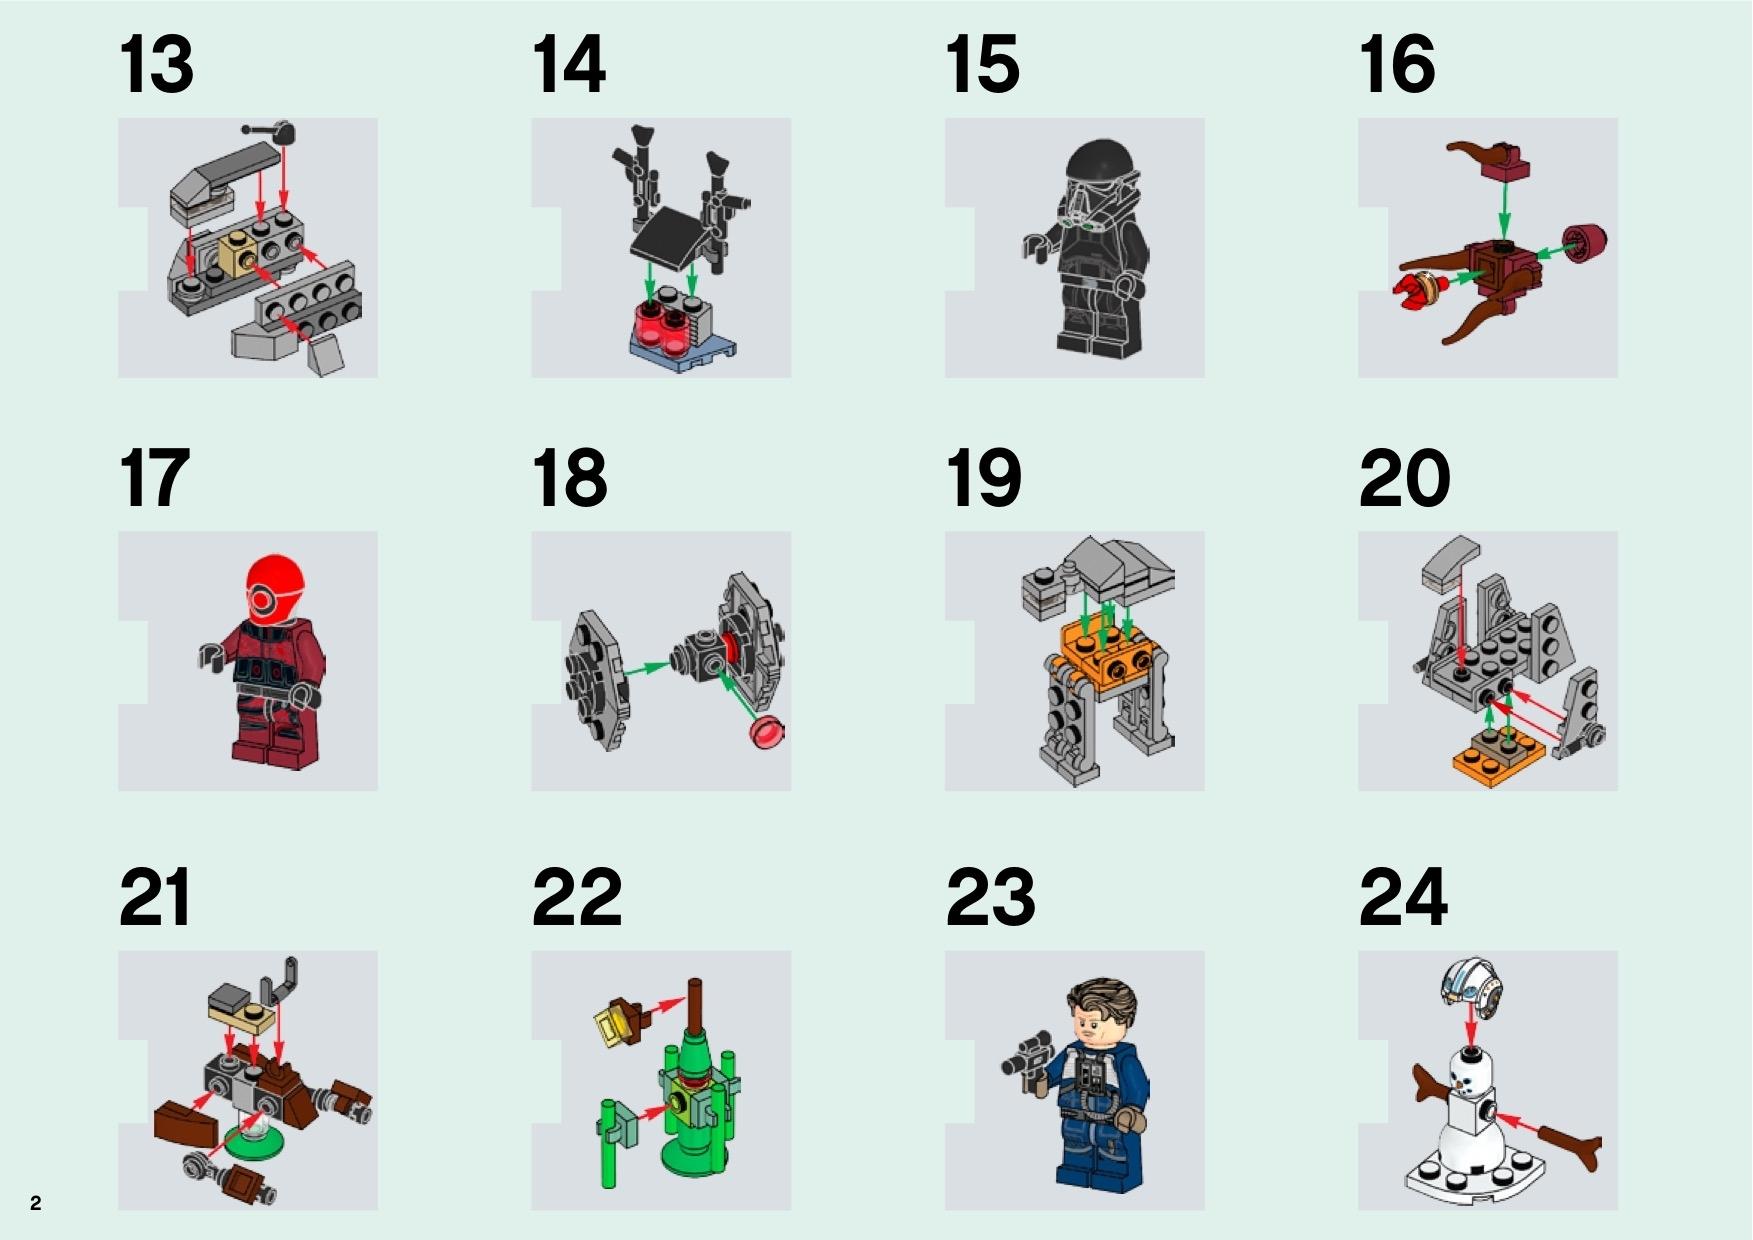 Lego 75213 Star Wars Advent Calendar Instructions, Star Wars within Lego Advent Calendar Star Wars Directions